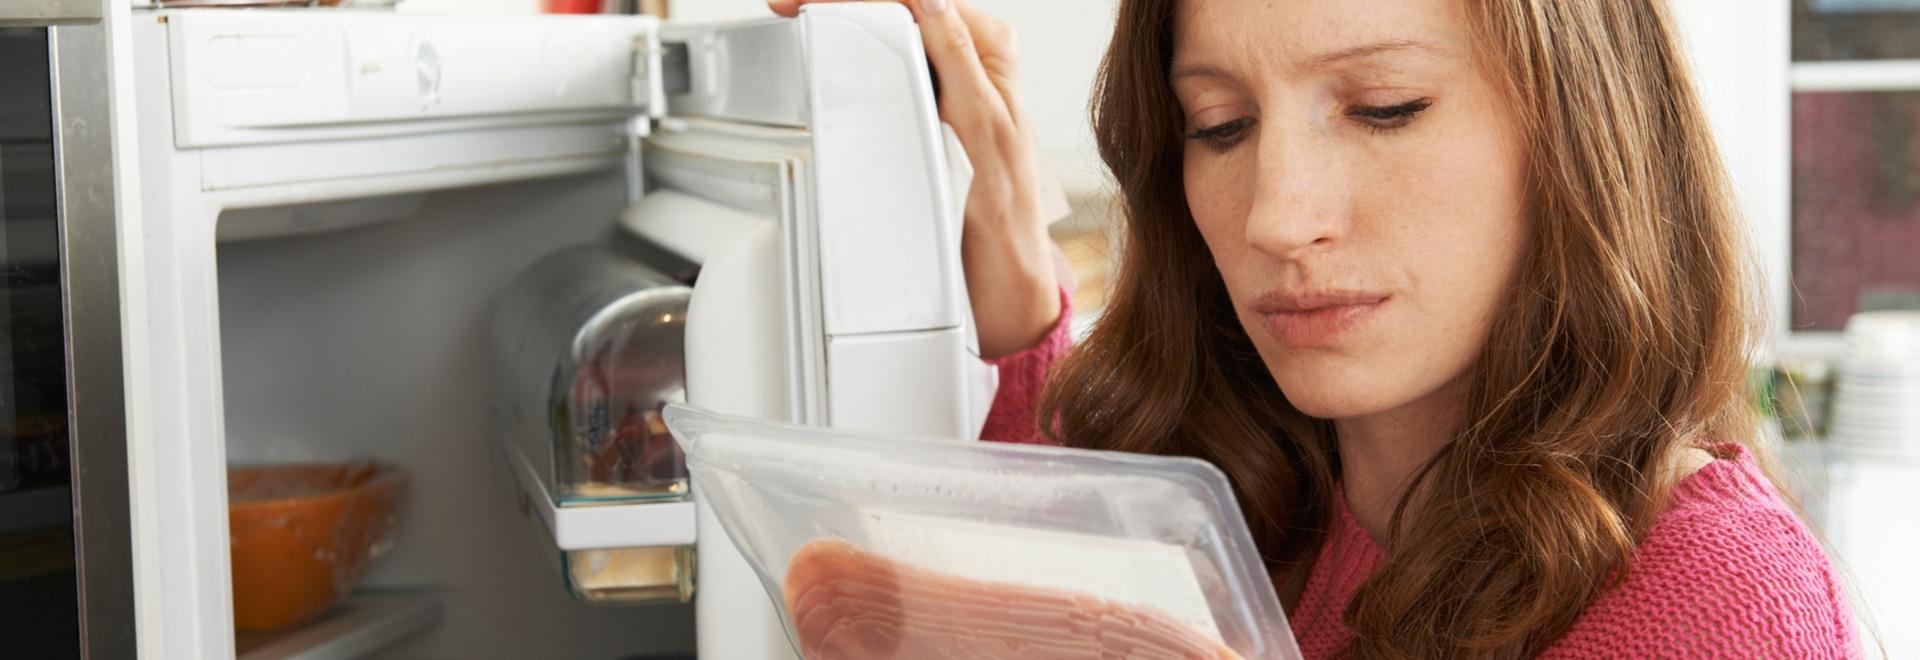 Bioelectronic 'Nase' kann Nahrungsmittelverlust ermitteln, indem er den Geruch des Todes abfragt